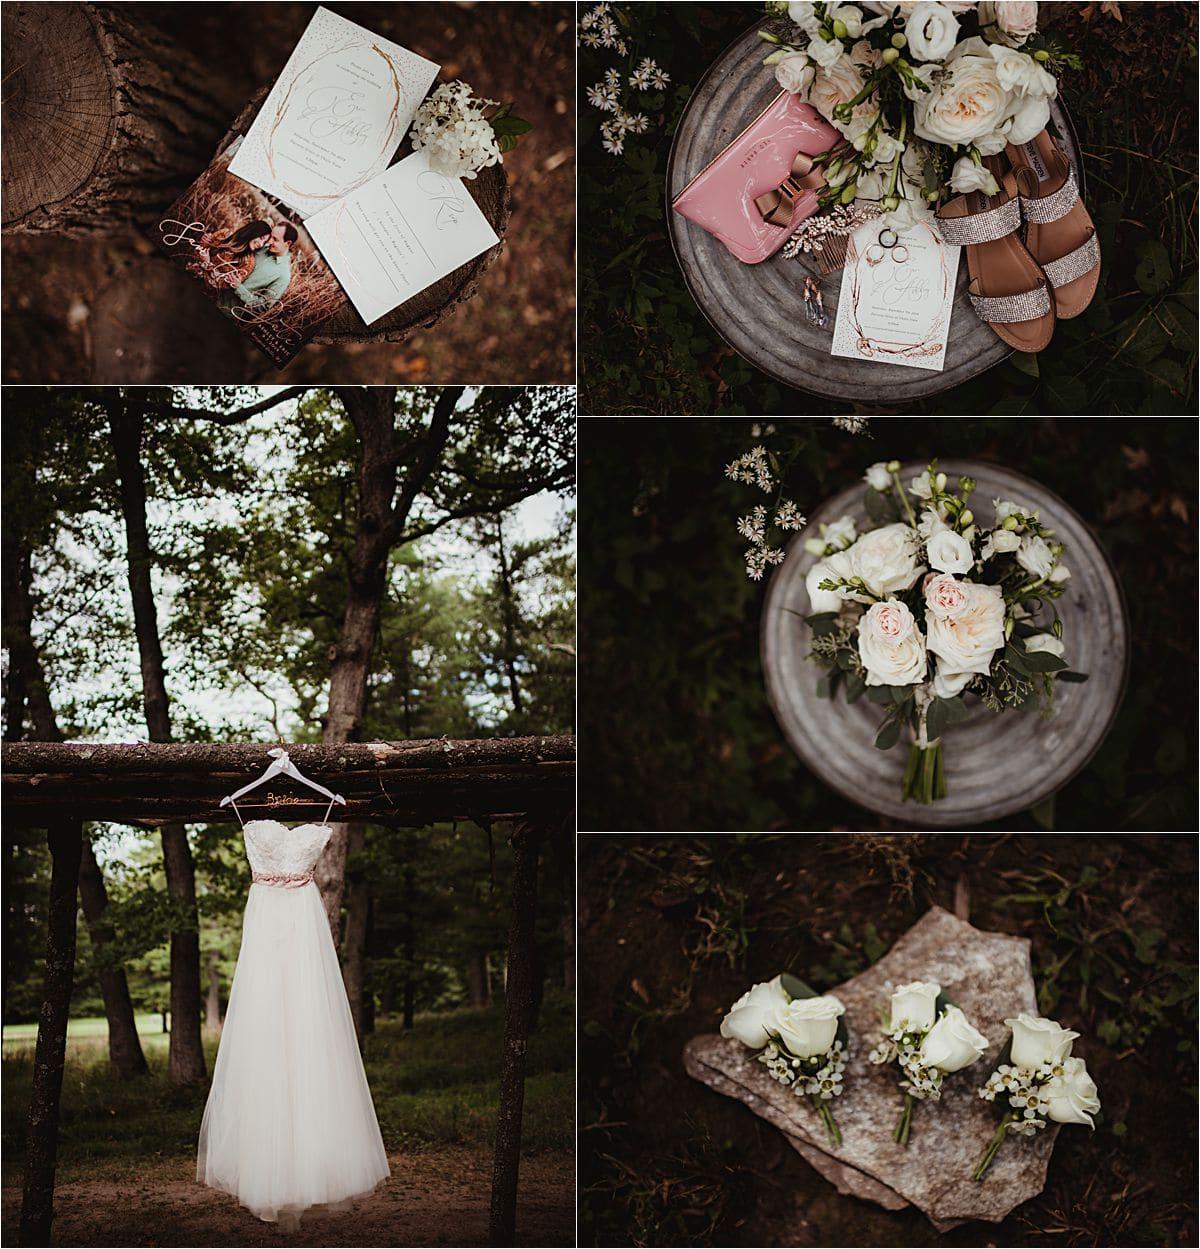 Outdoor Wedding Wisconsin: Chula Vista Resort Outdoor Fall Wedding